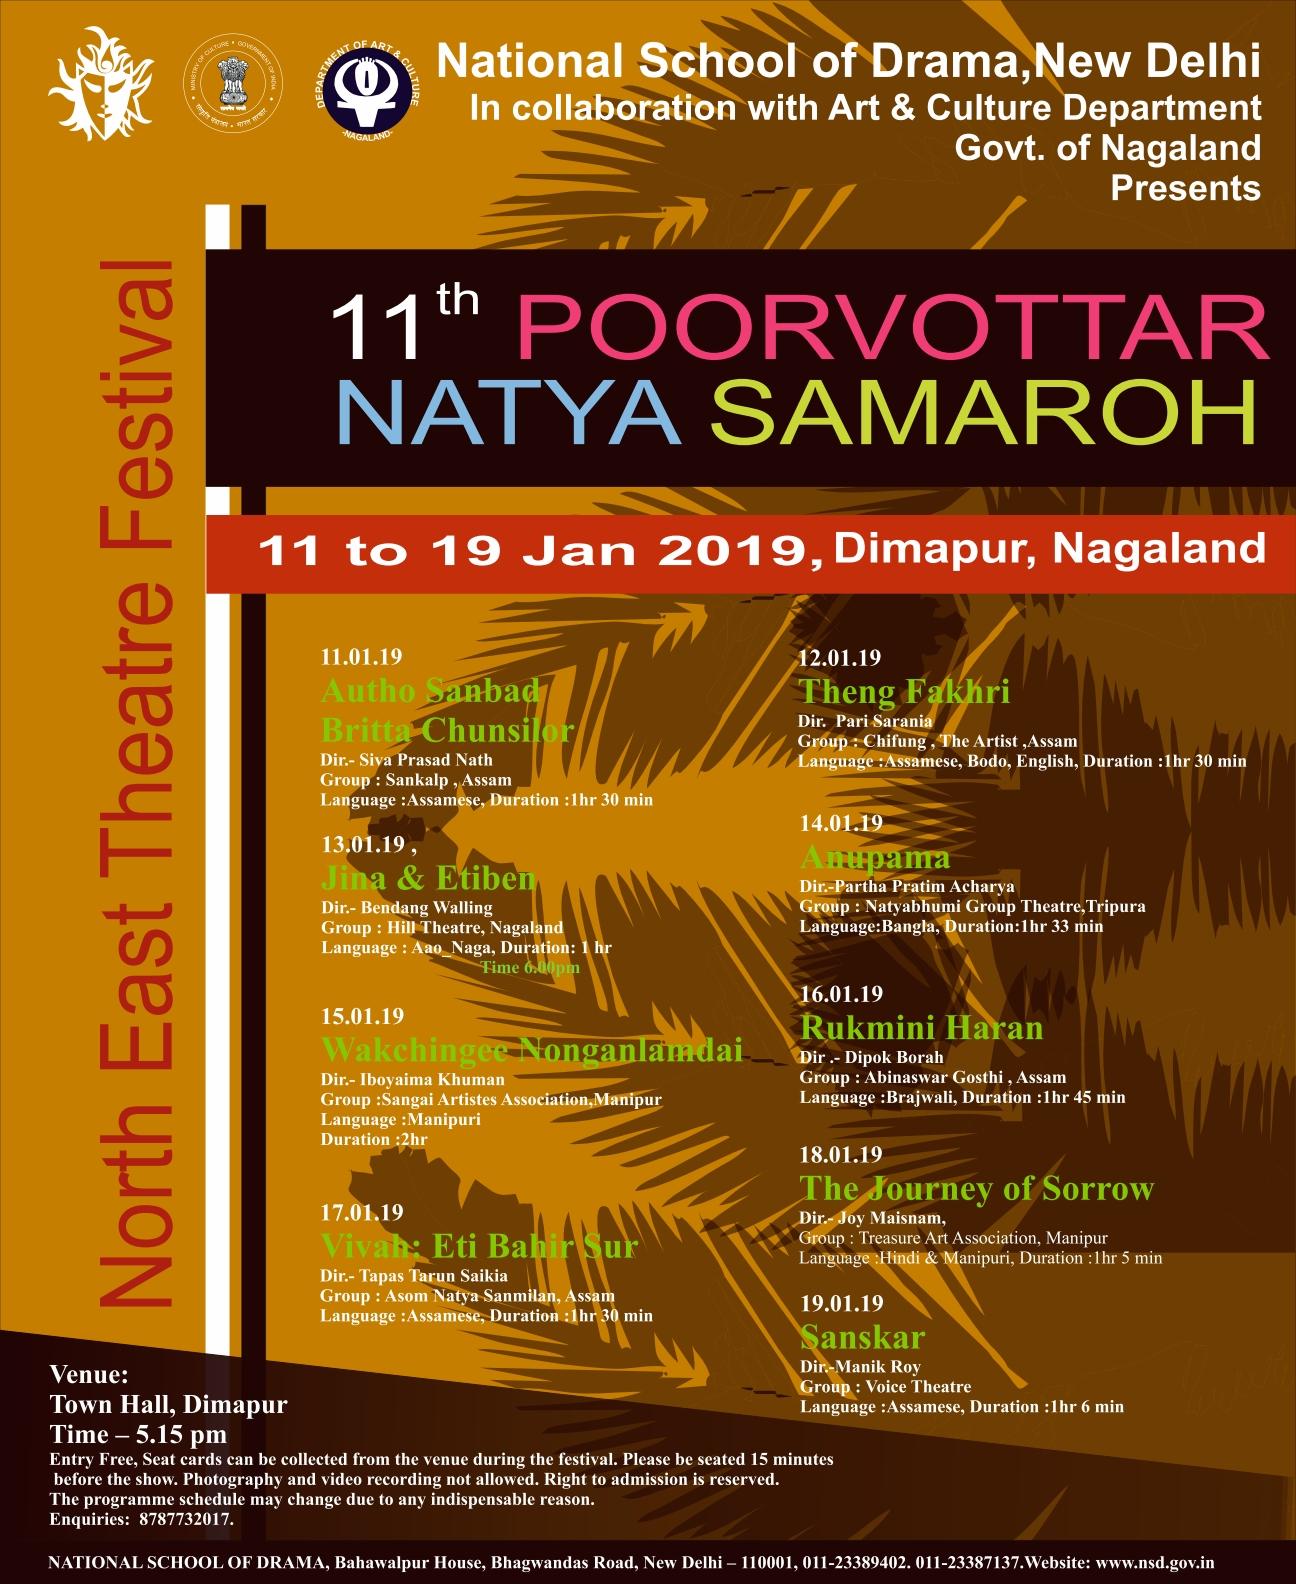 11th Poorvottar Natya Samaroh